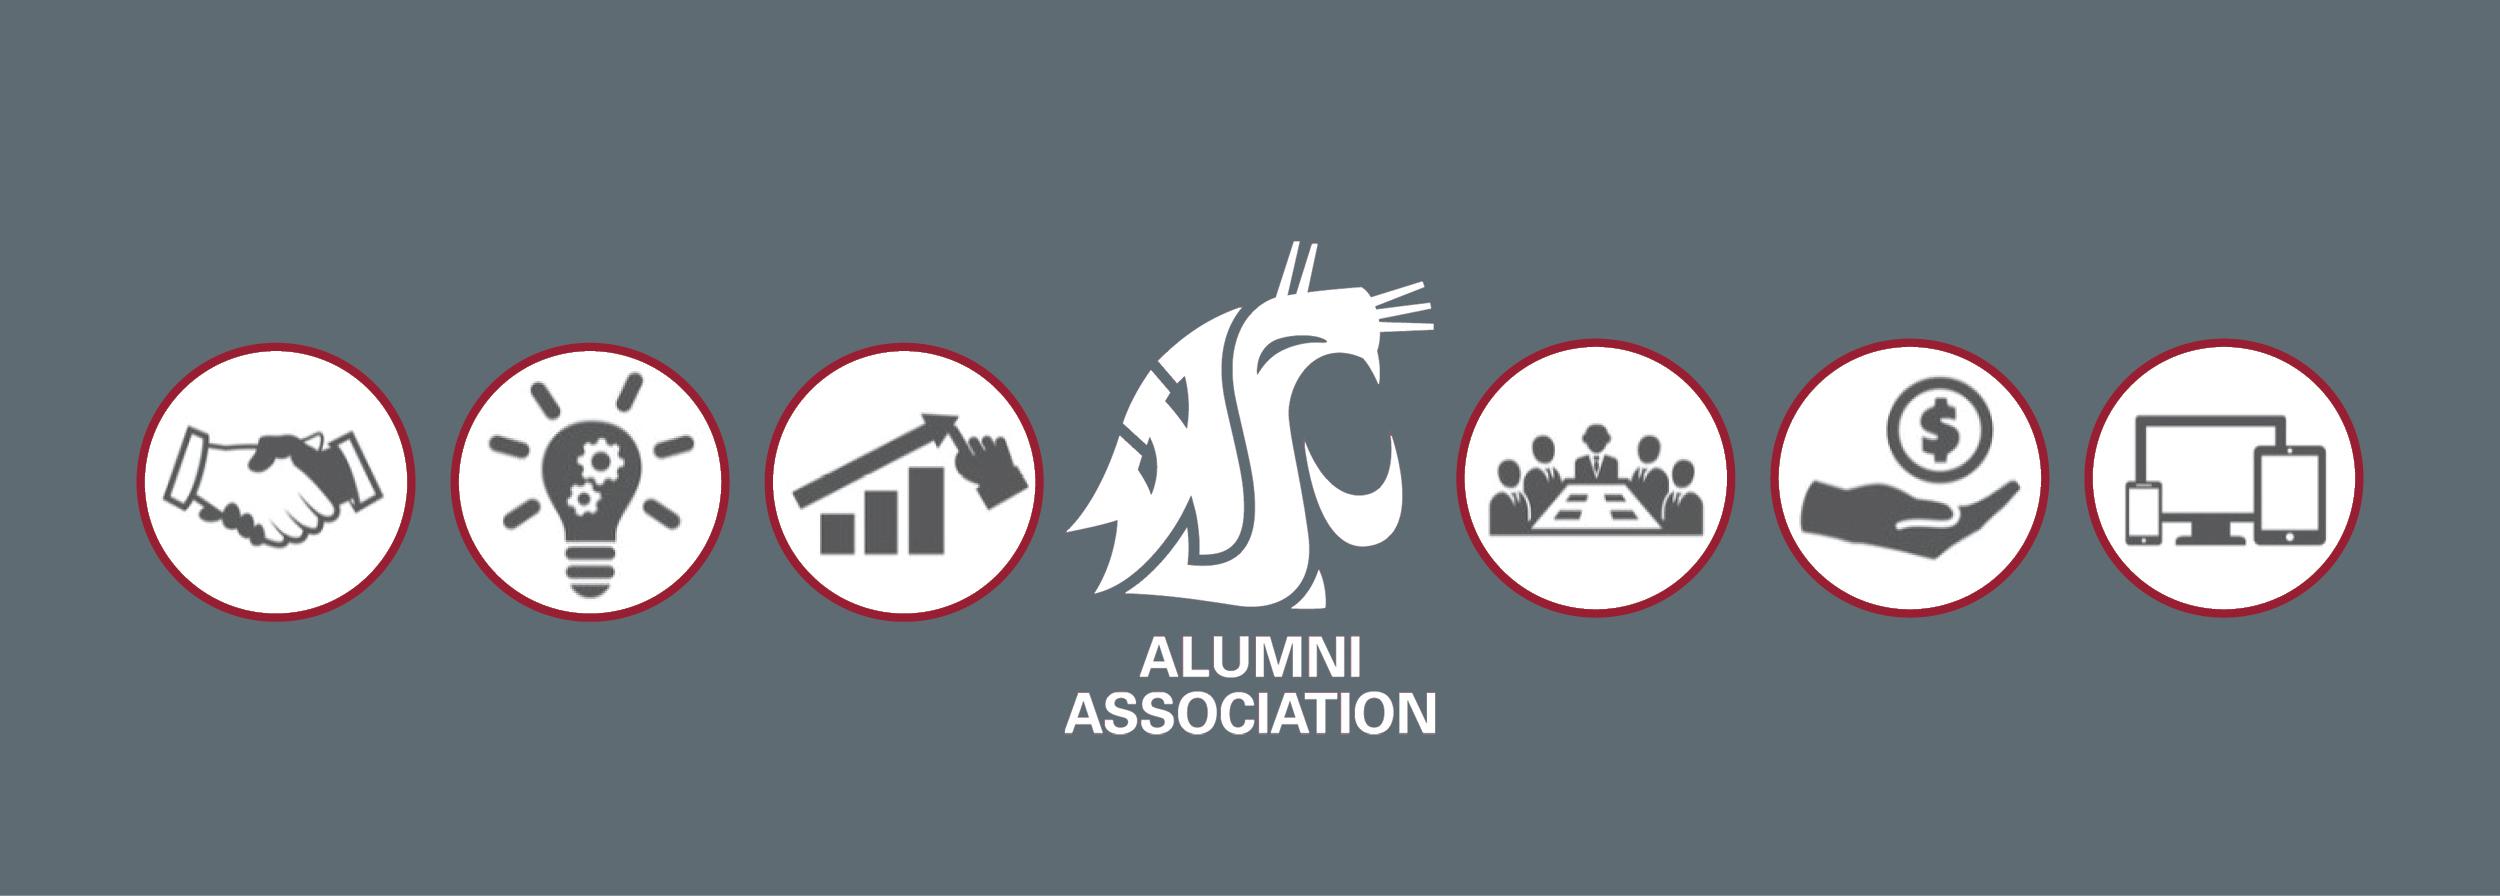 Image for Cougar Career Academy: Networking Virtually webinar